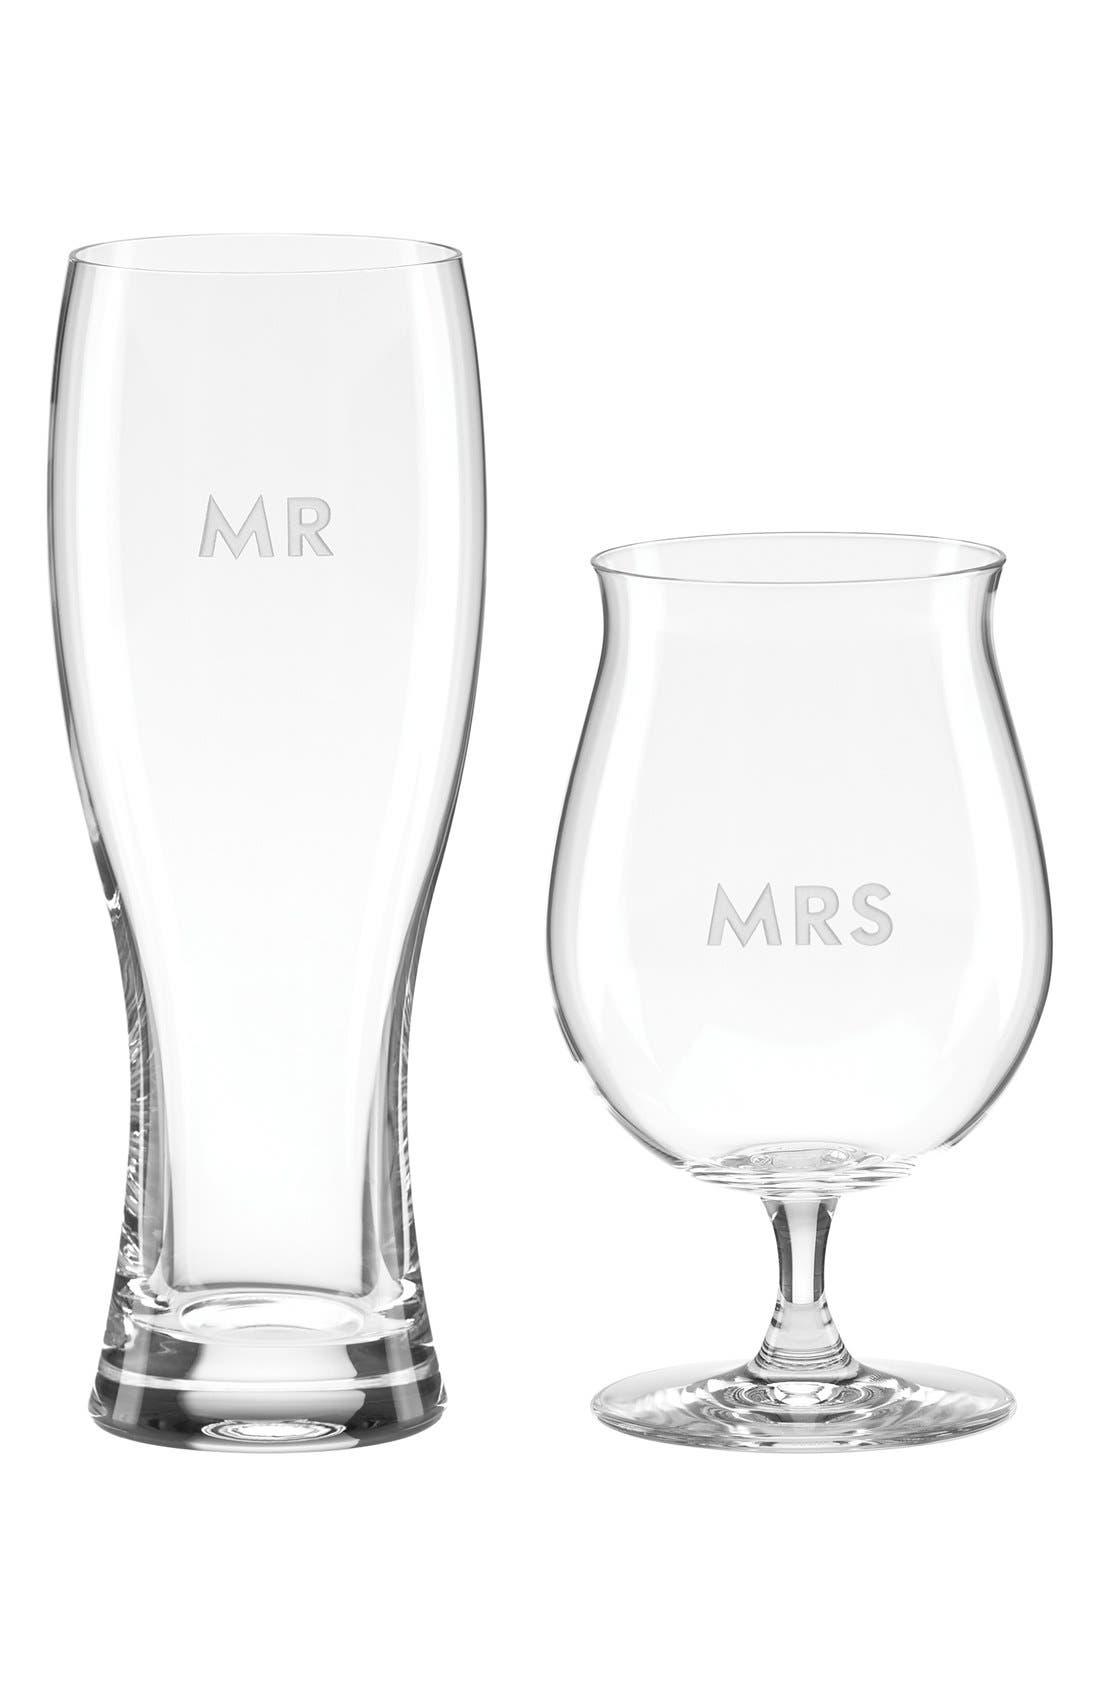 kate spade new york 'darling point mr. & mrs.' beer glasses (Set of 2)